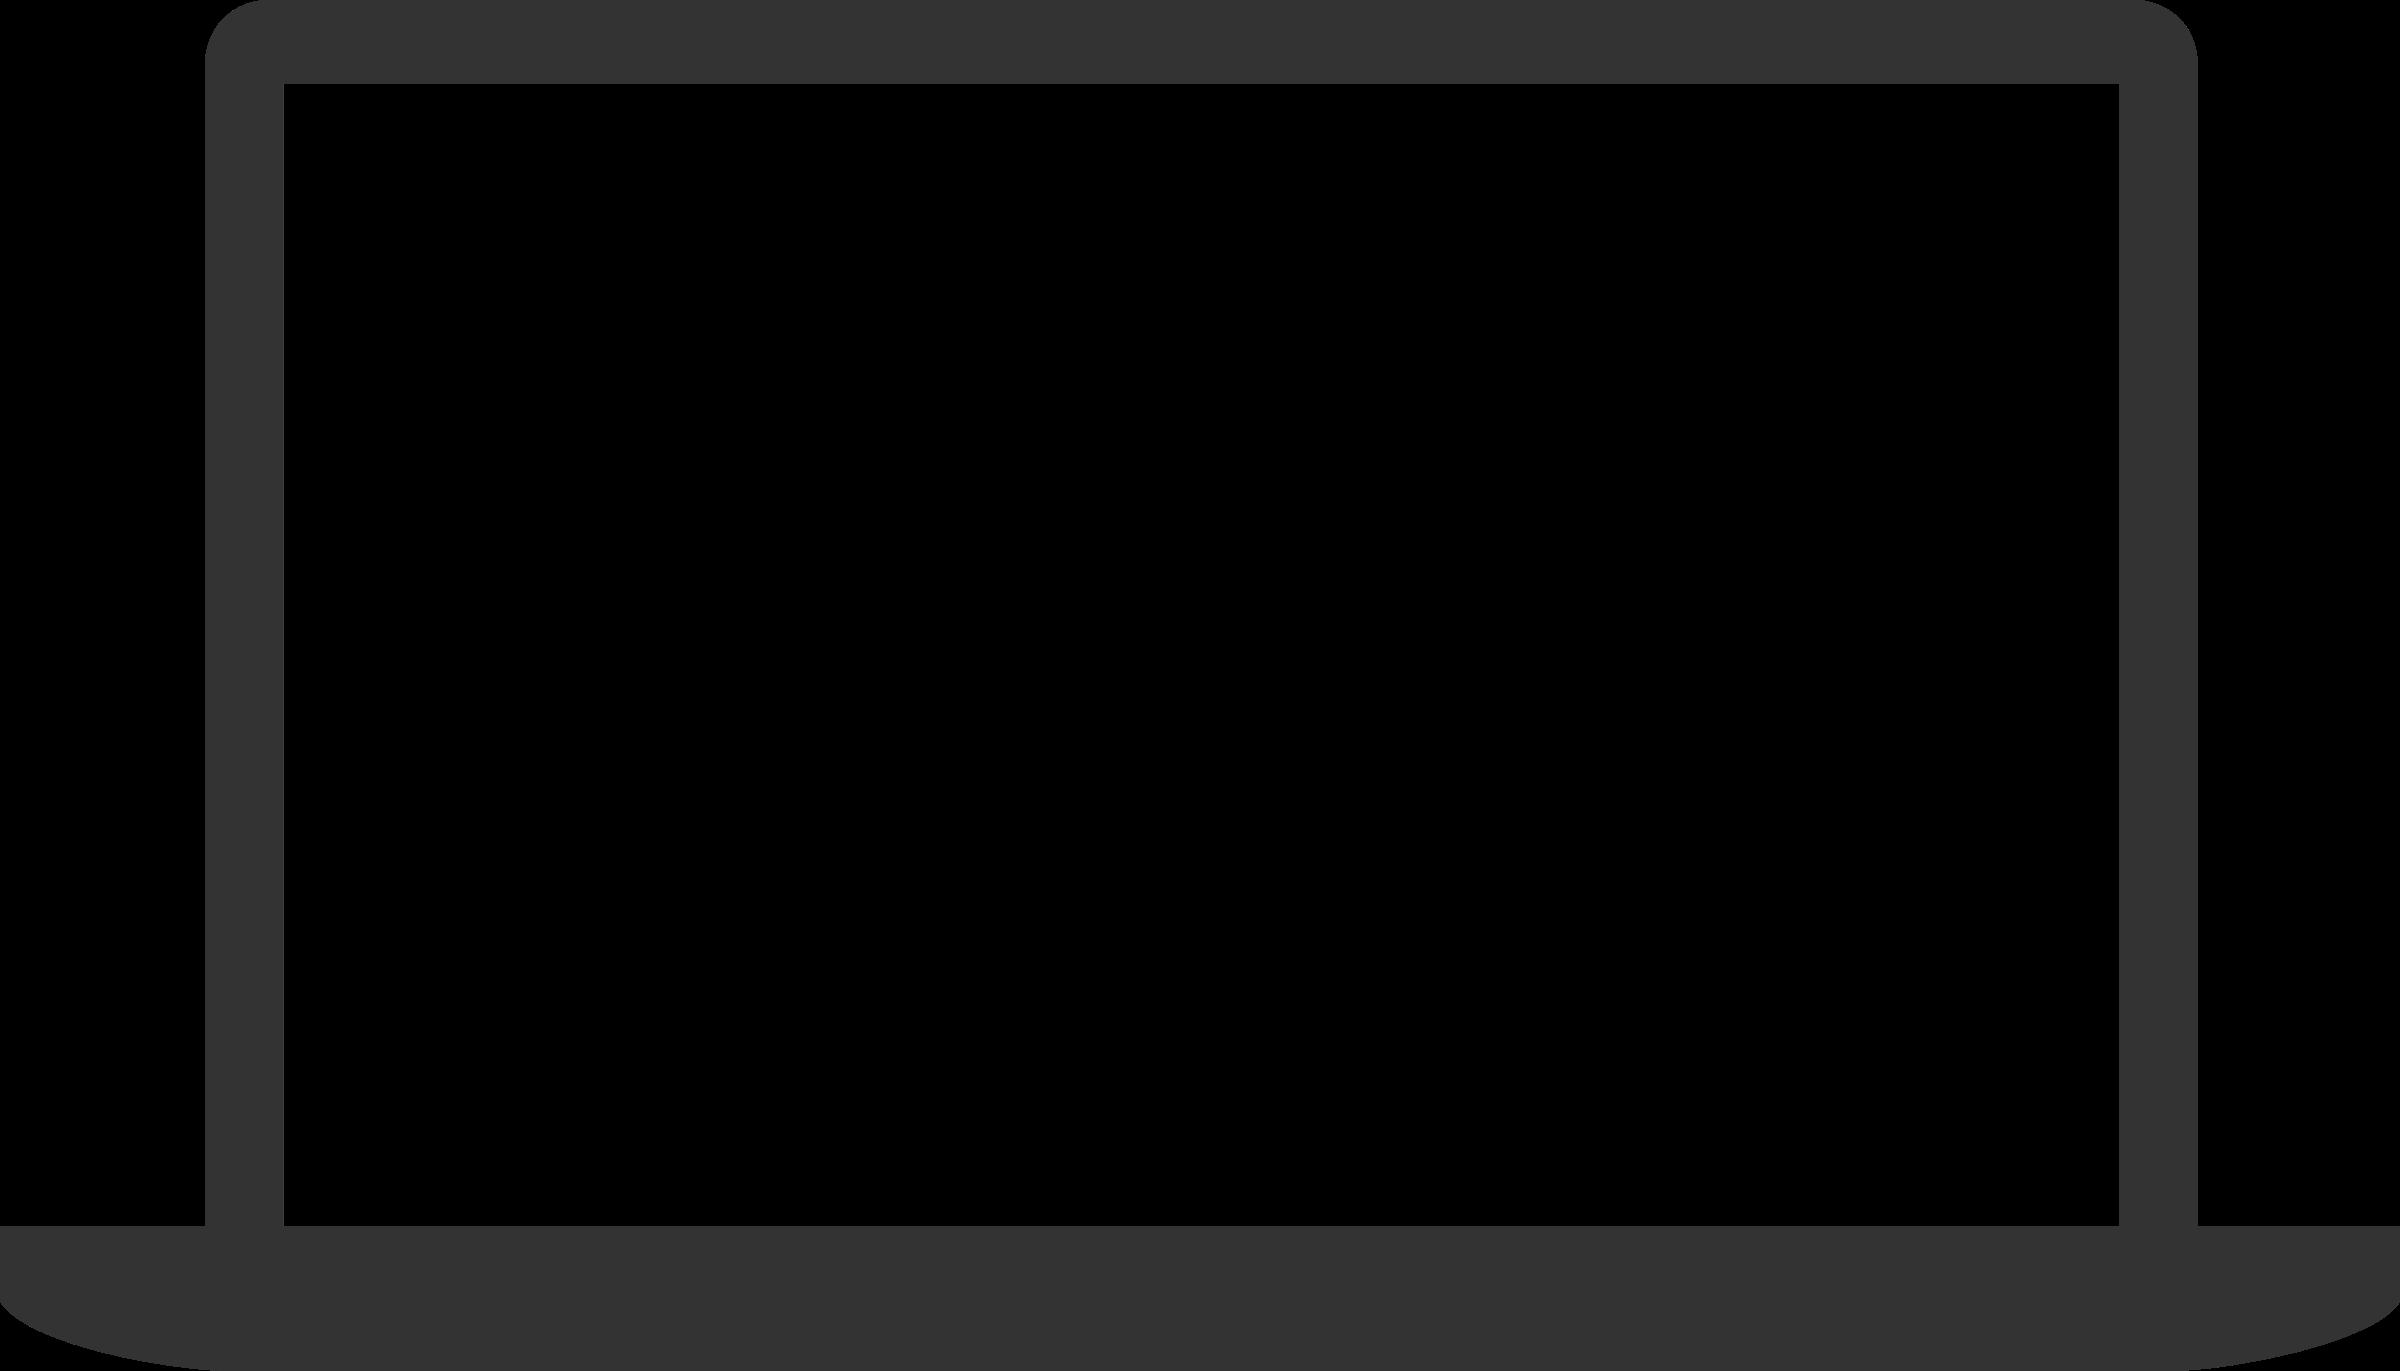 Apple MacBook Pro Logo PNG Transparent SVG Vector